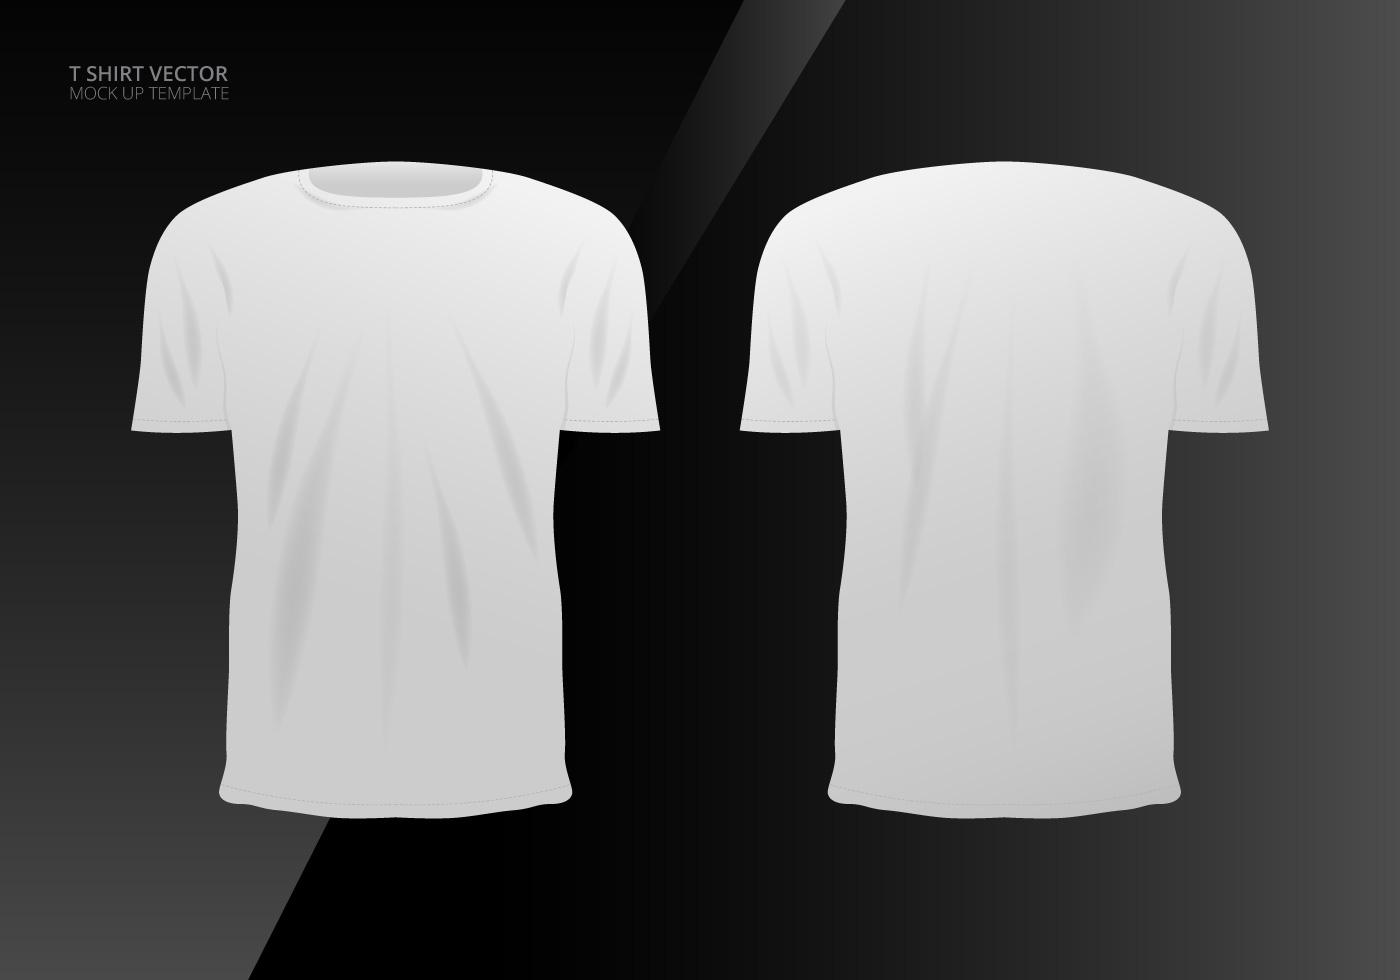 t shirt mock up free vector art 3582 free downloads